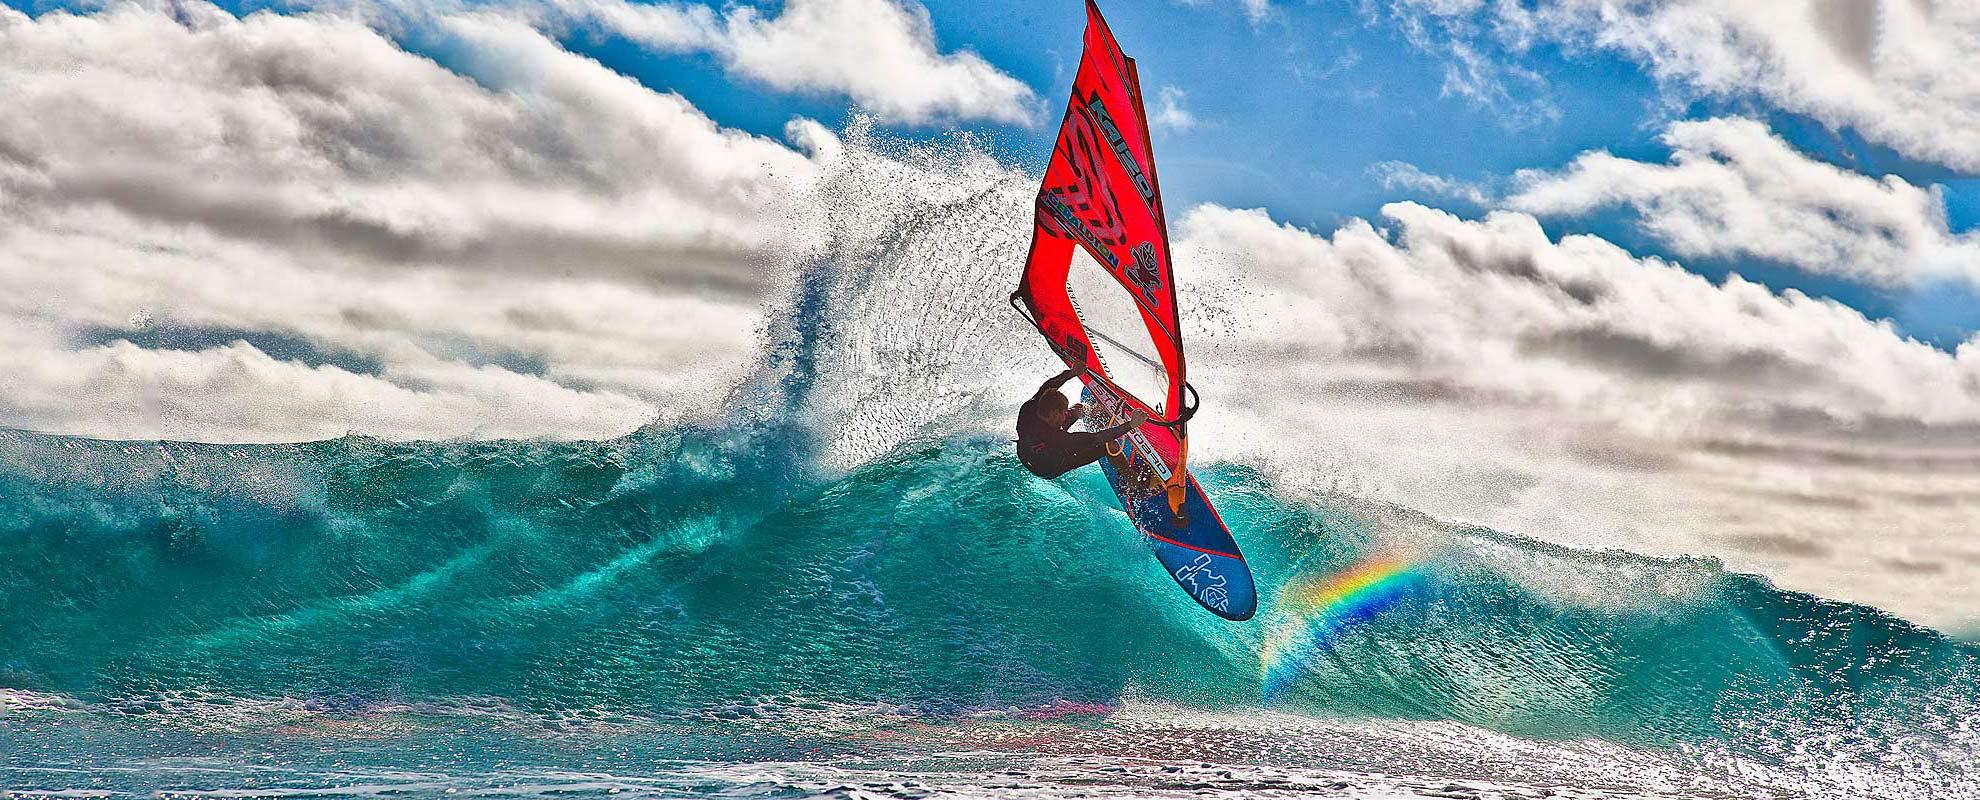 Windsurfing Landing 2020 - Starboard Windsurfing